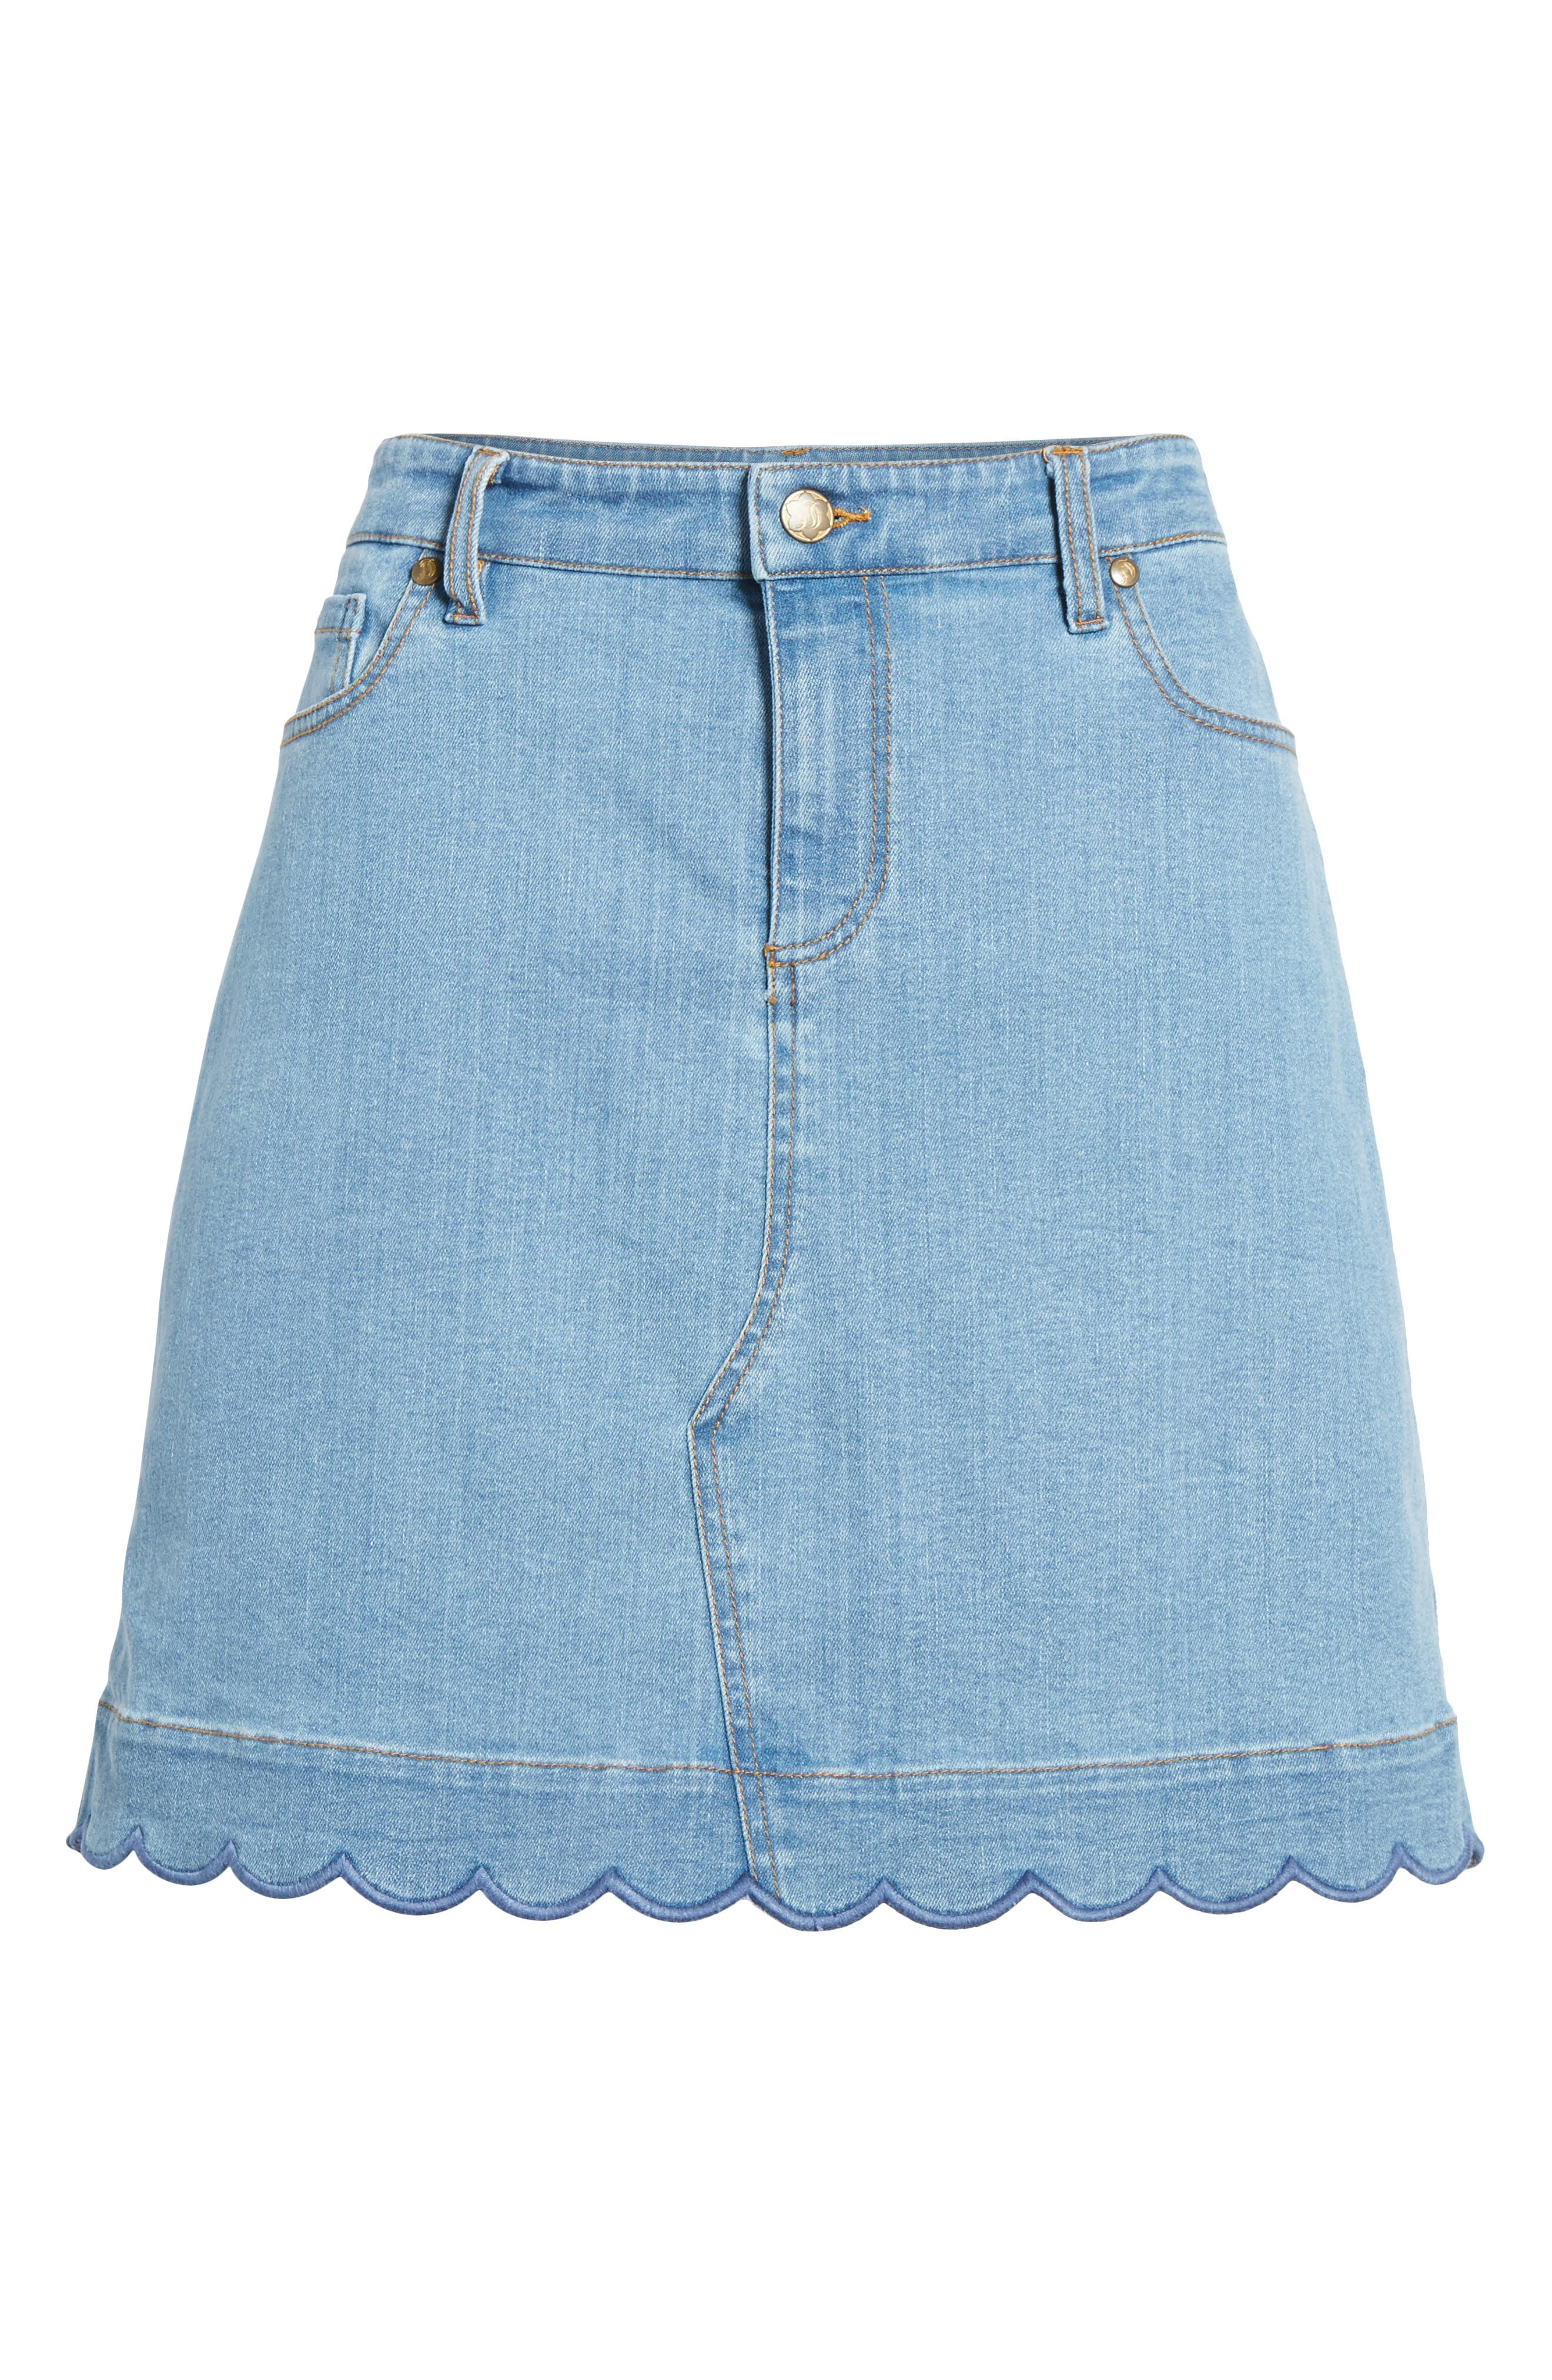 Scallop Denim Skirt,                             Alternate thumbnail 6, color,                             Blue